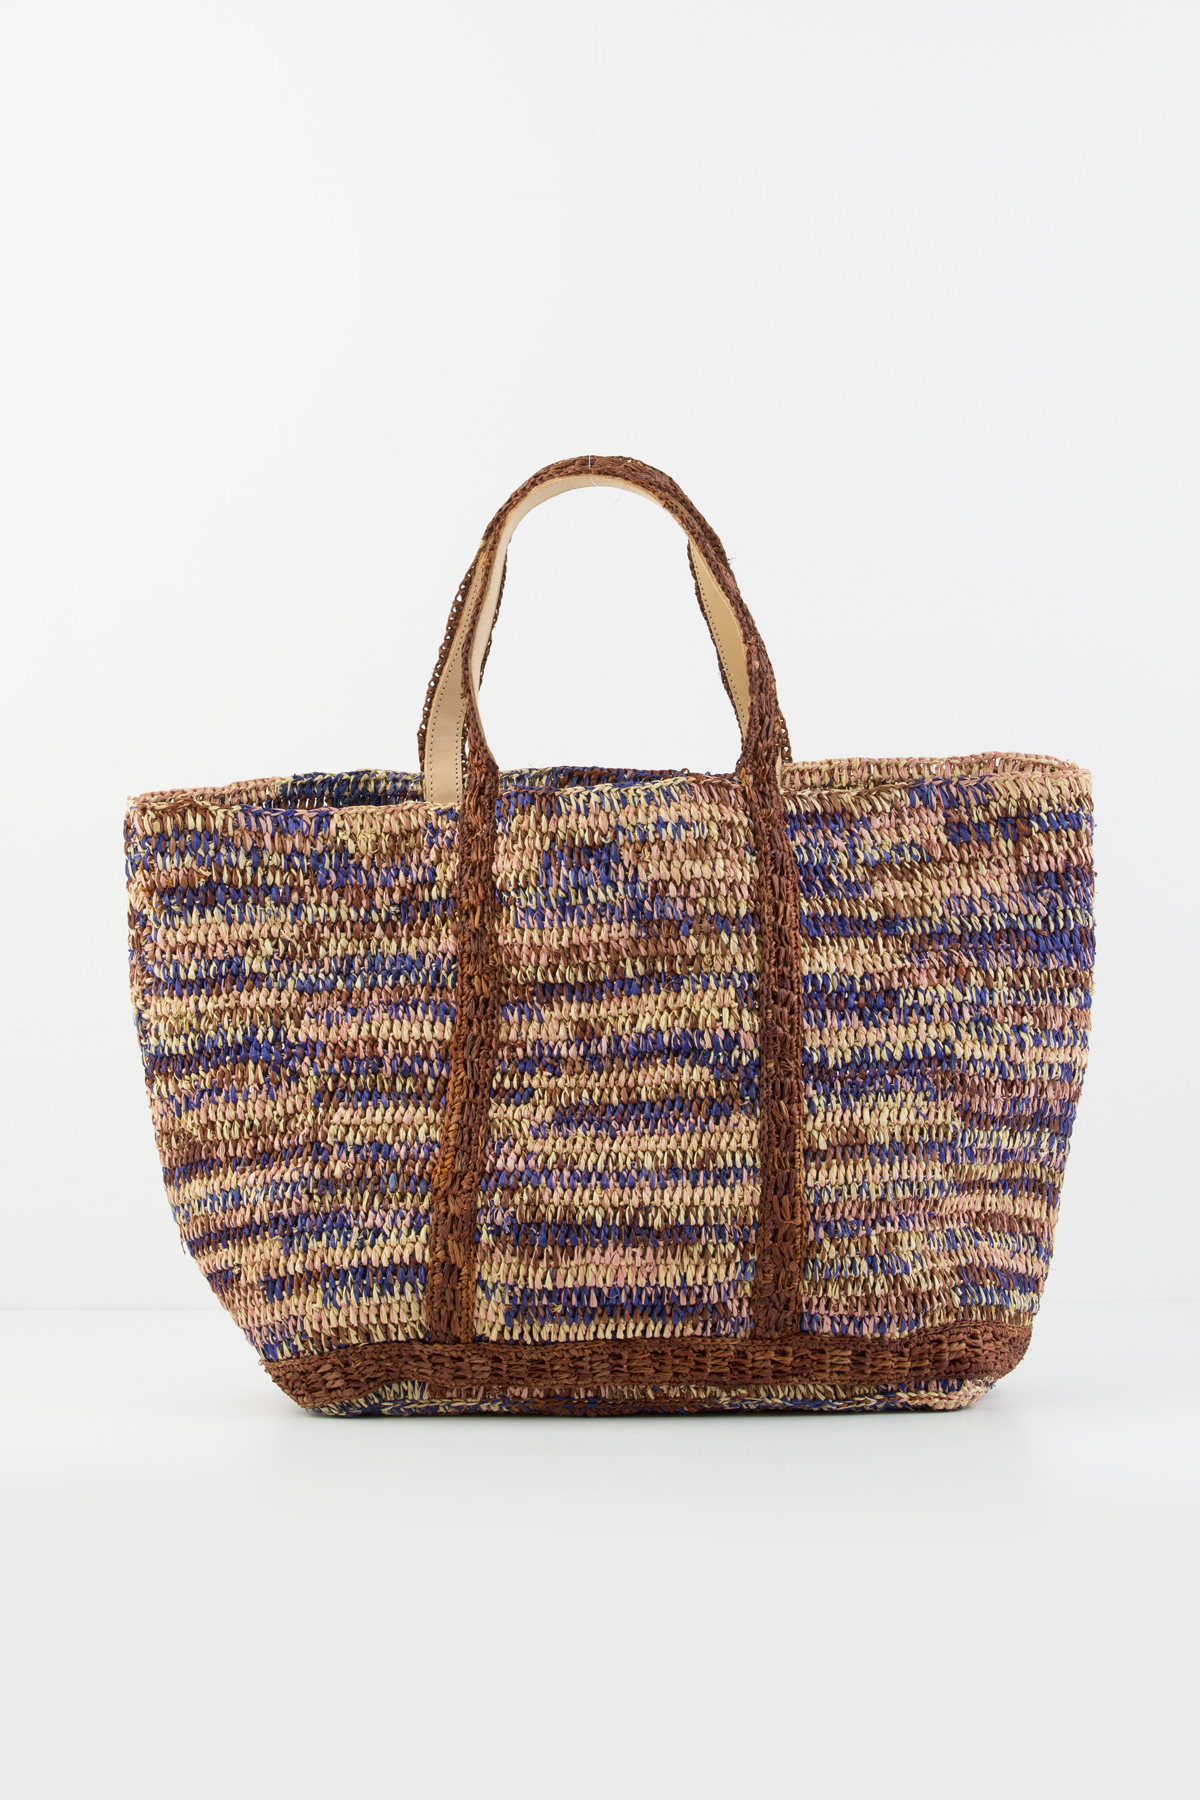 raphia-cabas-multicolor-tote-bag-braided-vanessa-bruno-matchboxathens